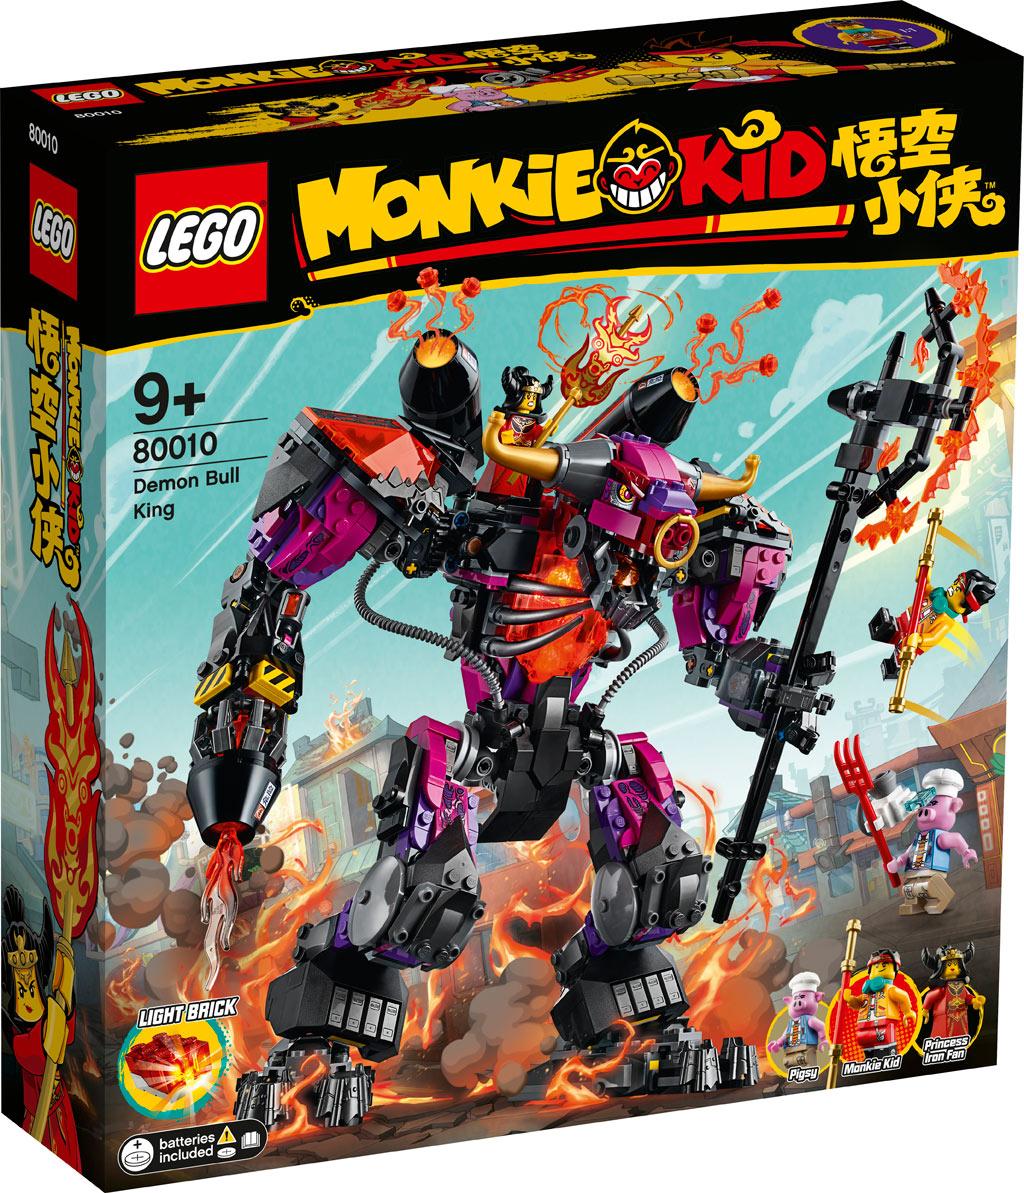 lego-monkie-kid-80010-demon-bull-king-2020-box zusammengebaut.com